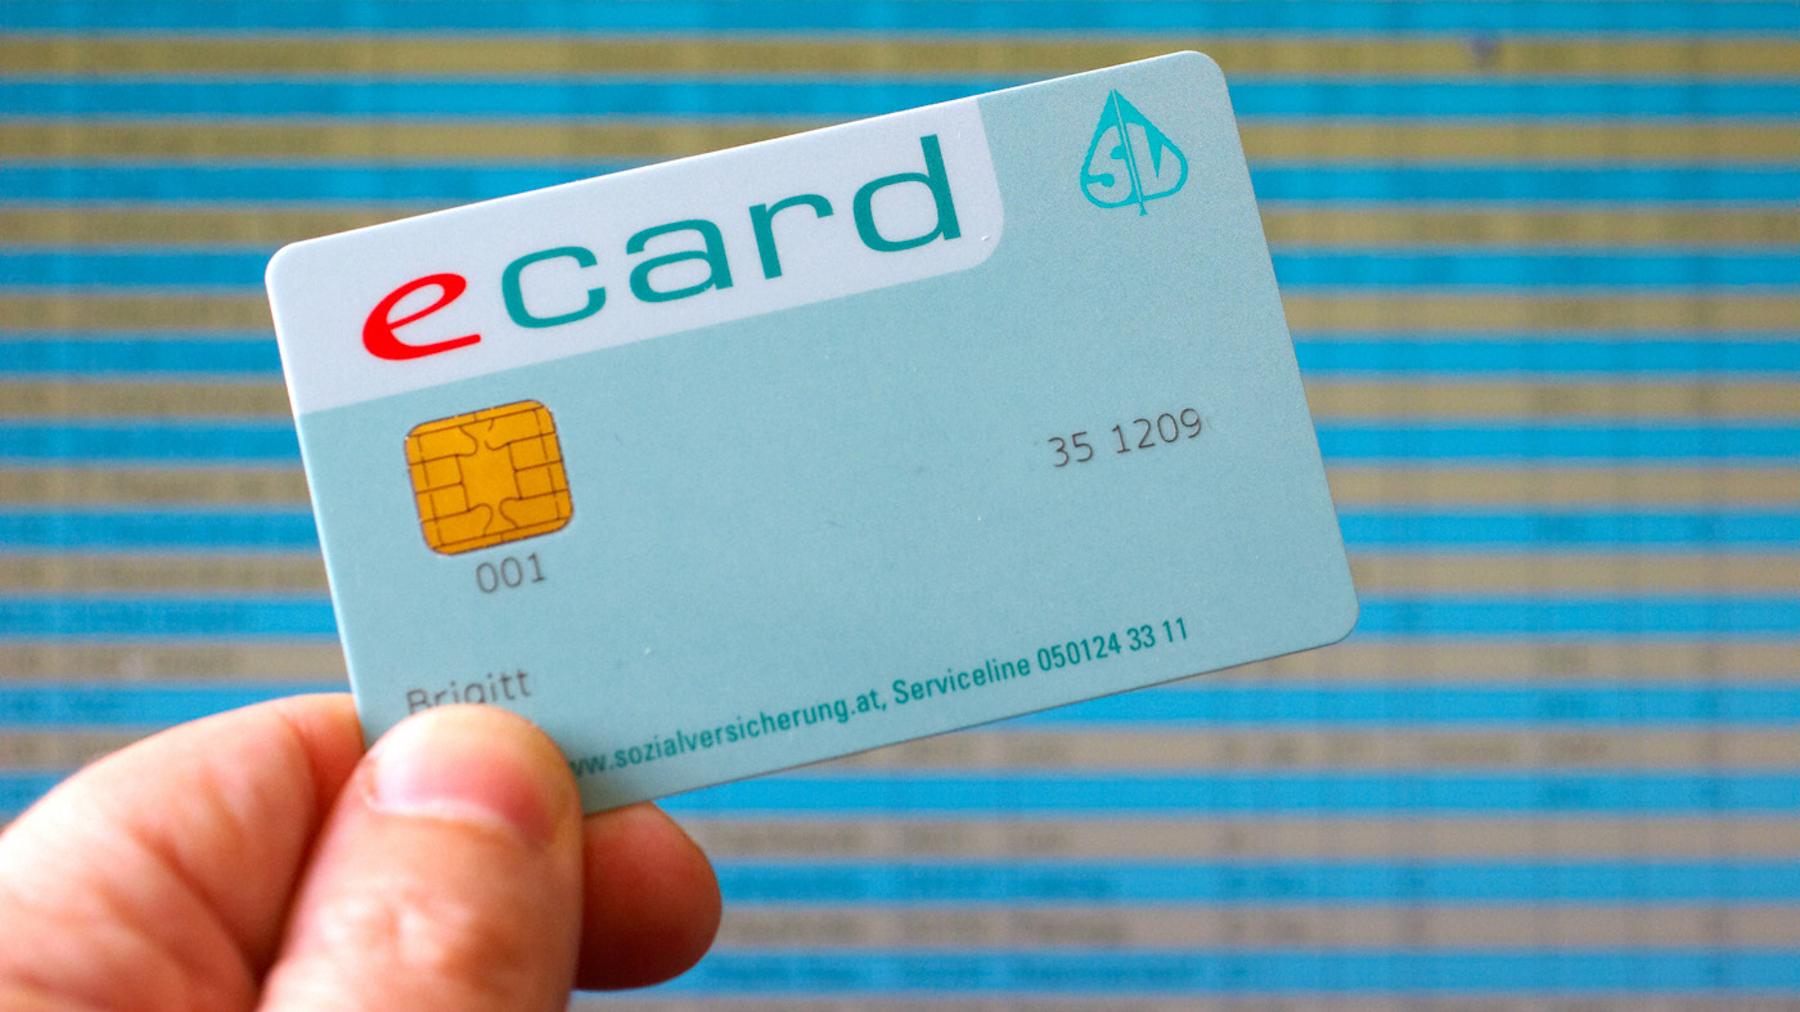 e-card der Sozialversicherung